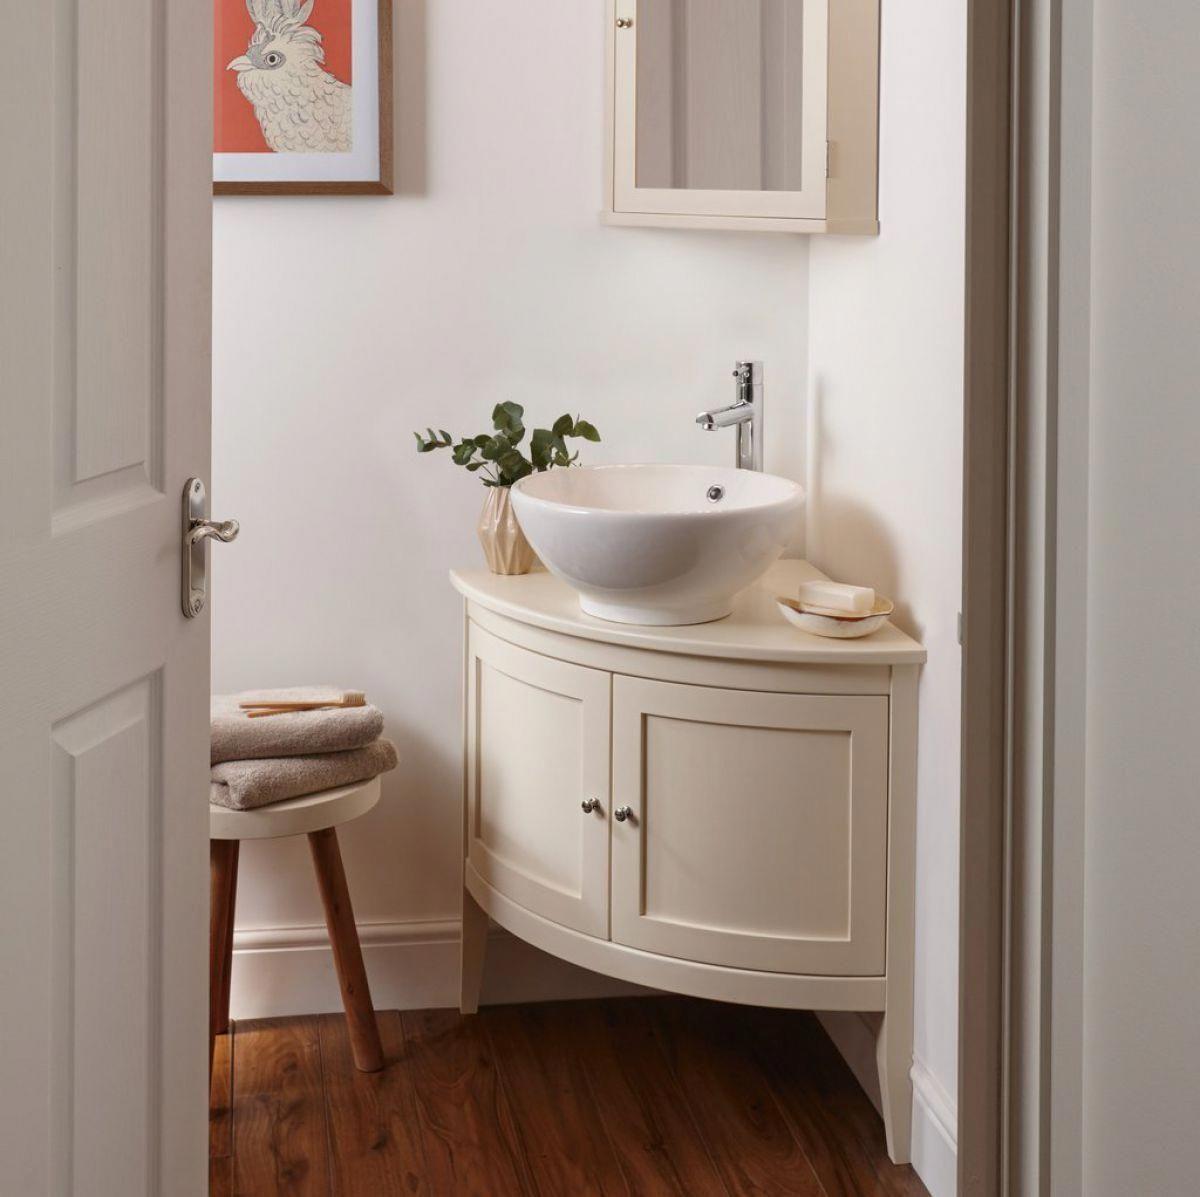 Imperial Westminster Victoria Corner Vessel Bowl Unit Bathroomsink Bathroom Furniture Corner Bathroom Vanity Small Bathroom